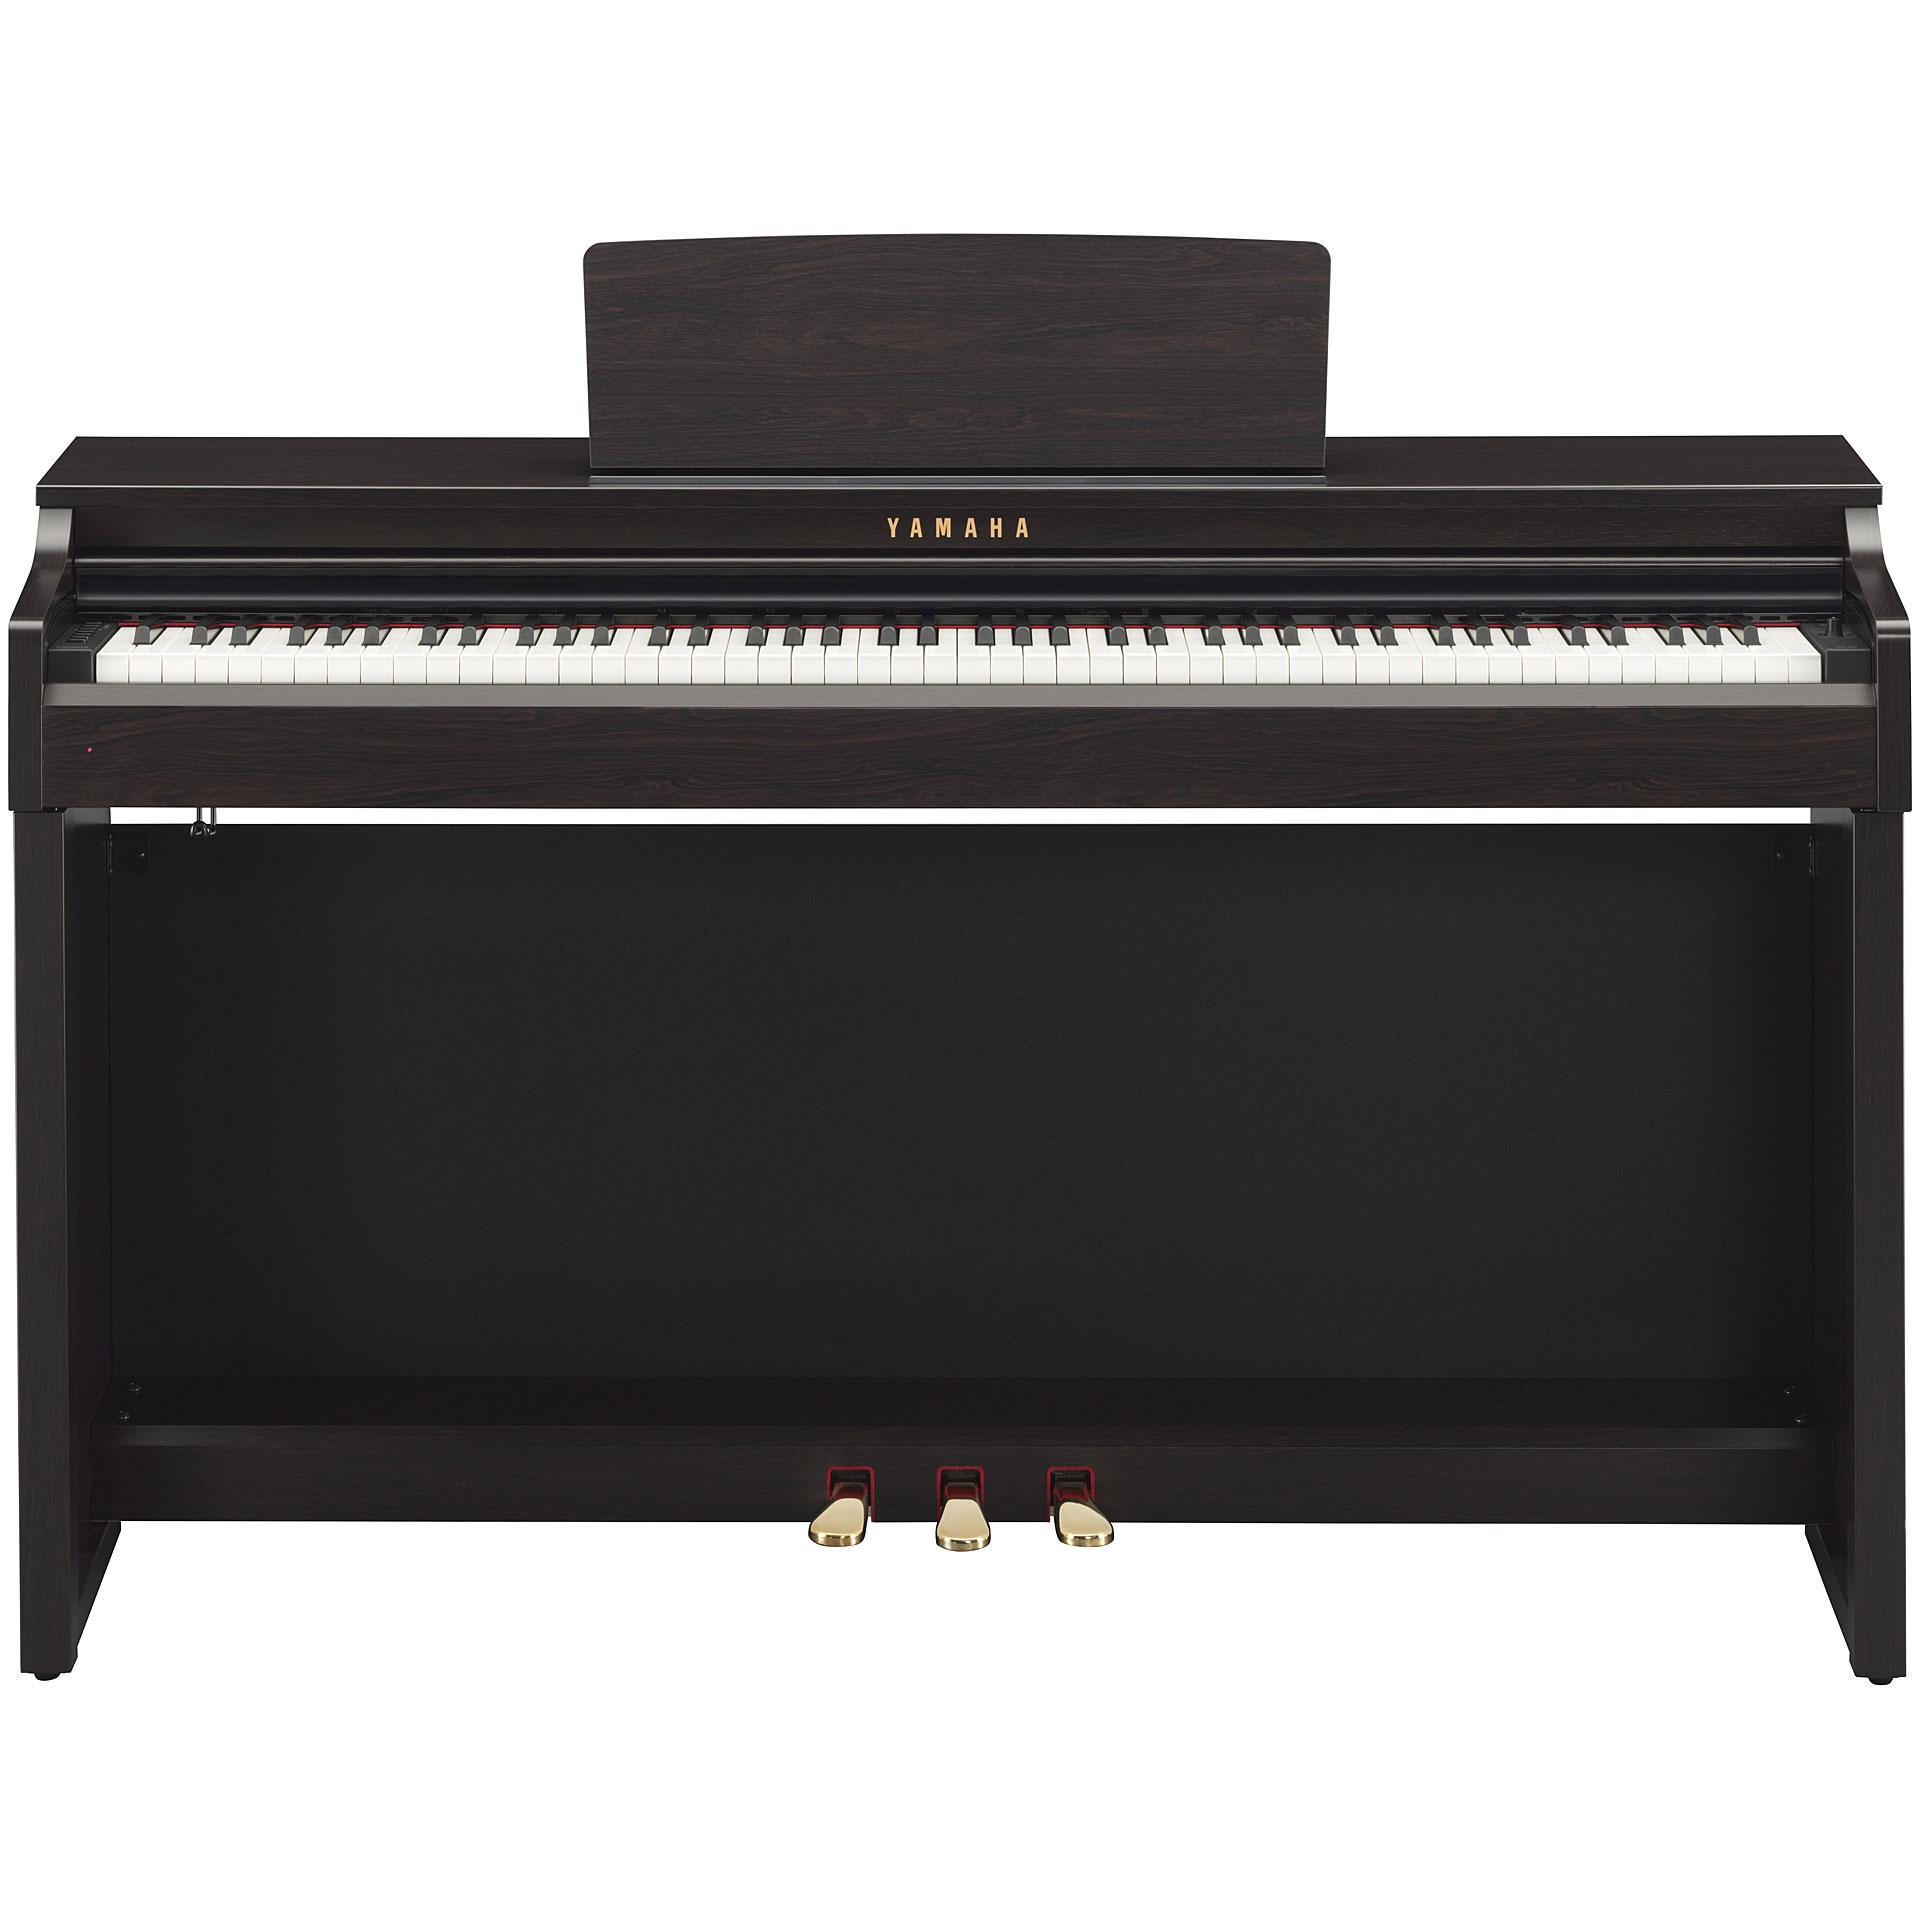 yamaha clavinova clp 525r digital piano. Black Bedroom Furniture Sets. Home Design Ideas